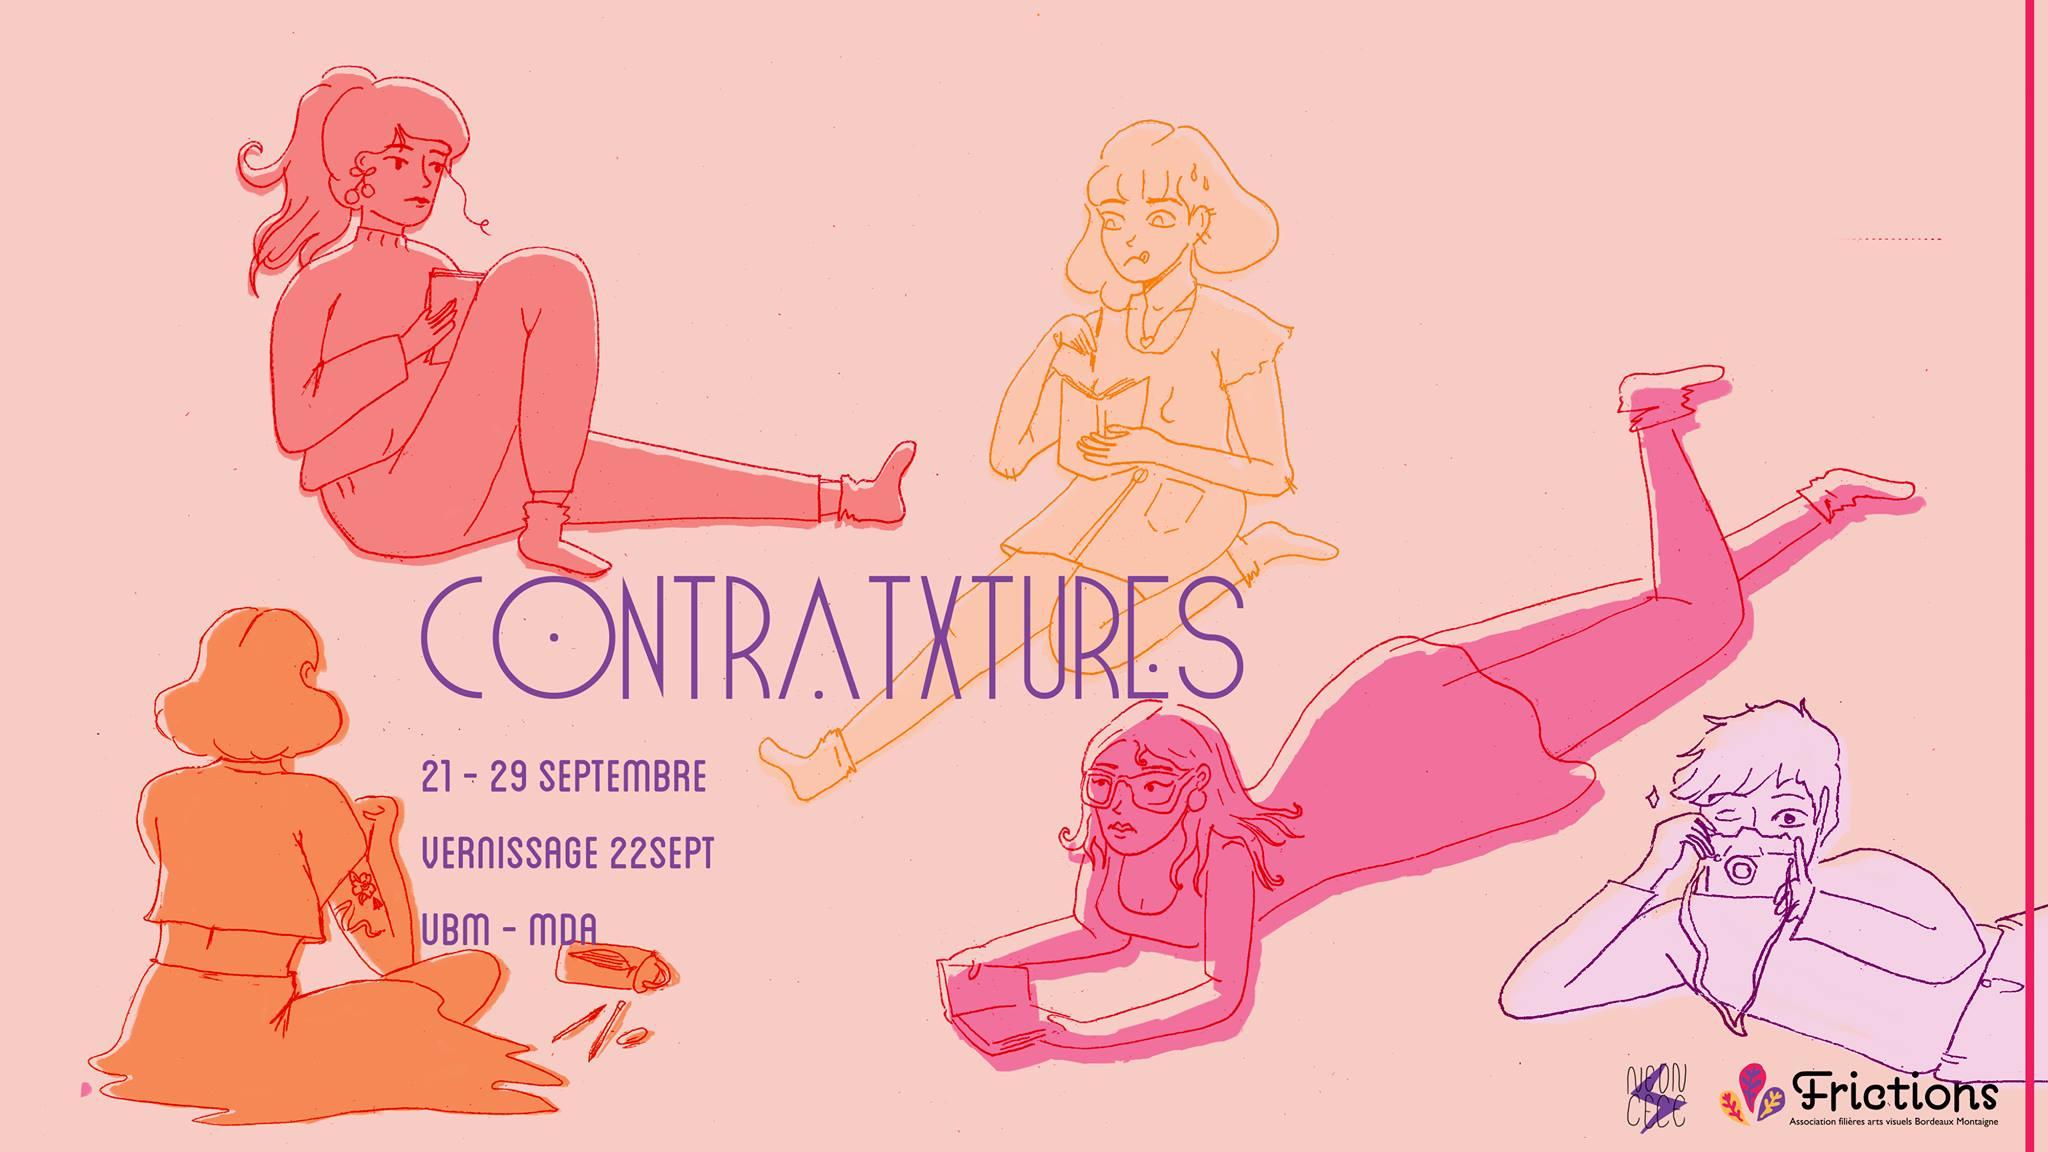 Contratxtures